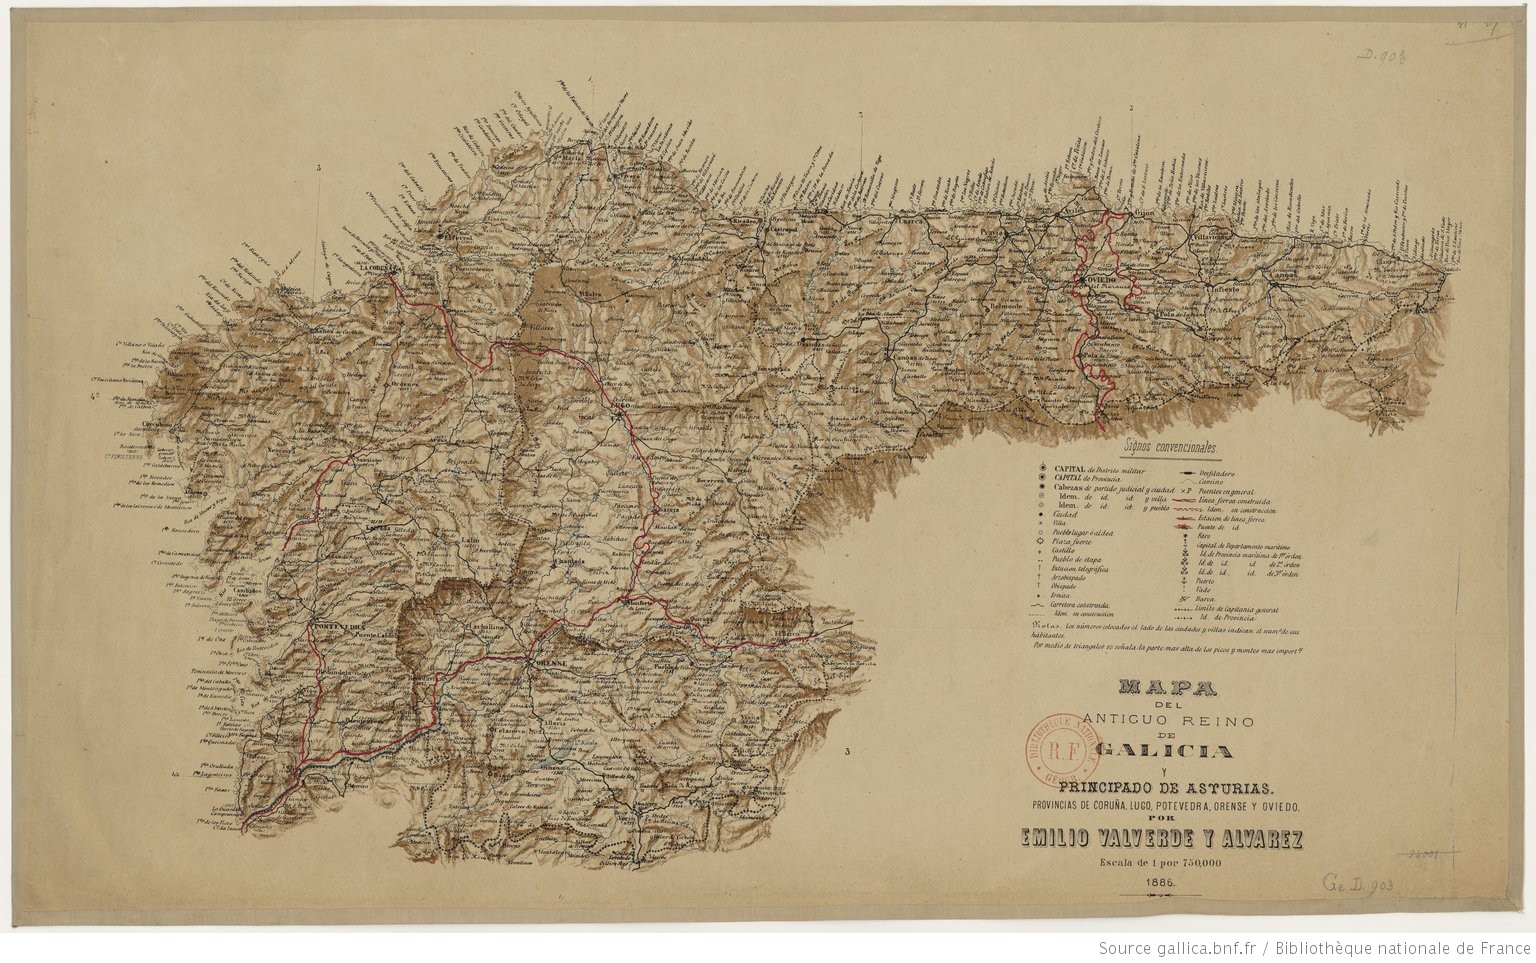 Mapa Reino De Asturias.Mapa Del Antiguo Reino De Galicia Y Principado De Asturias Provincias De Coruna Lugo Pontevedra Orense Y Oviedo Por Emilio Valverde Y Alvarez Gallica